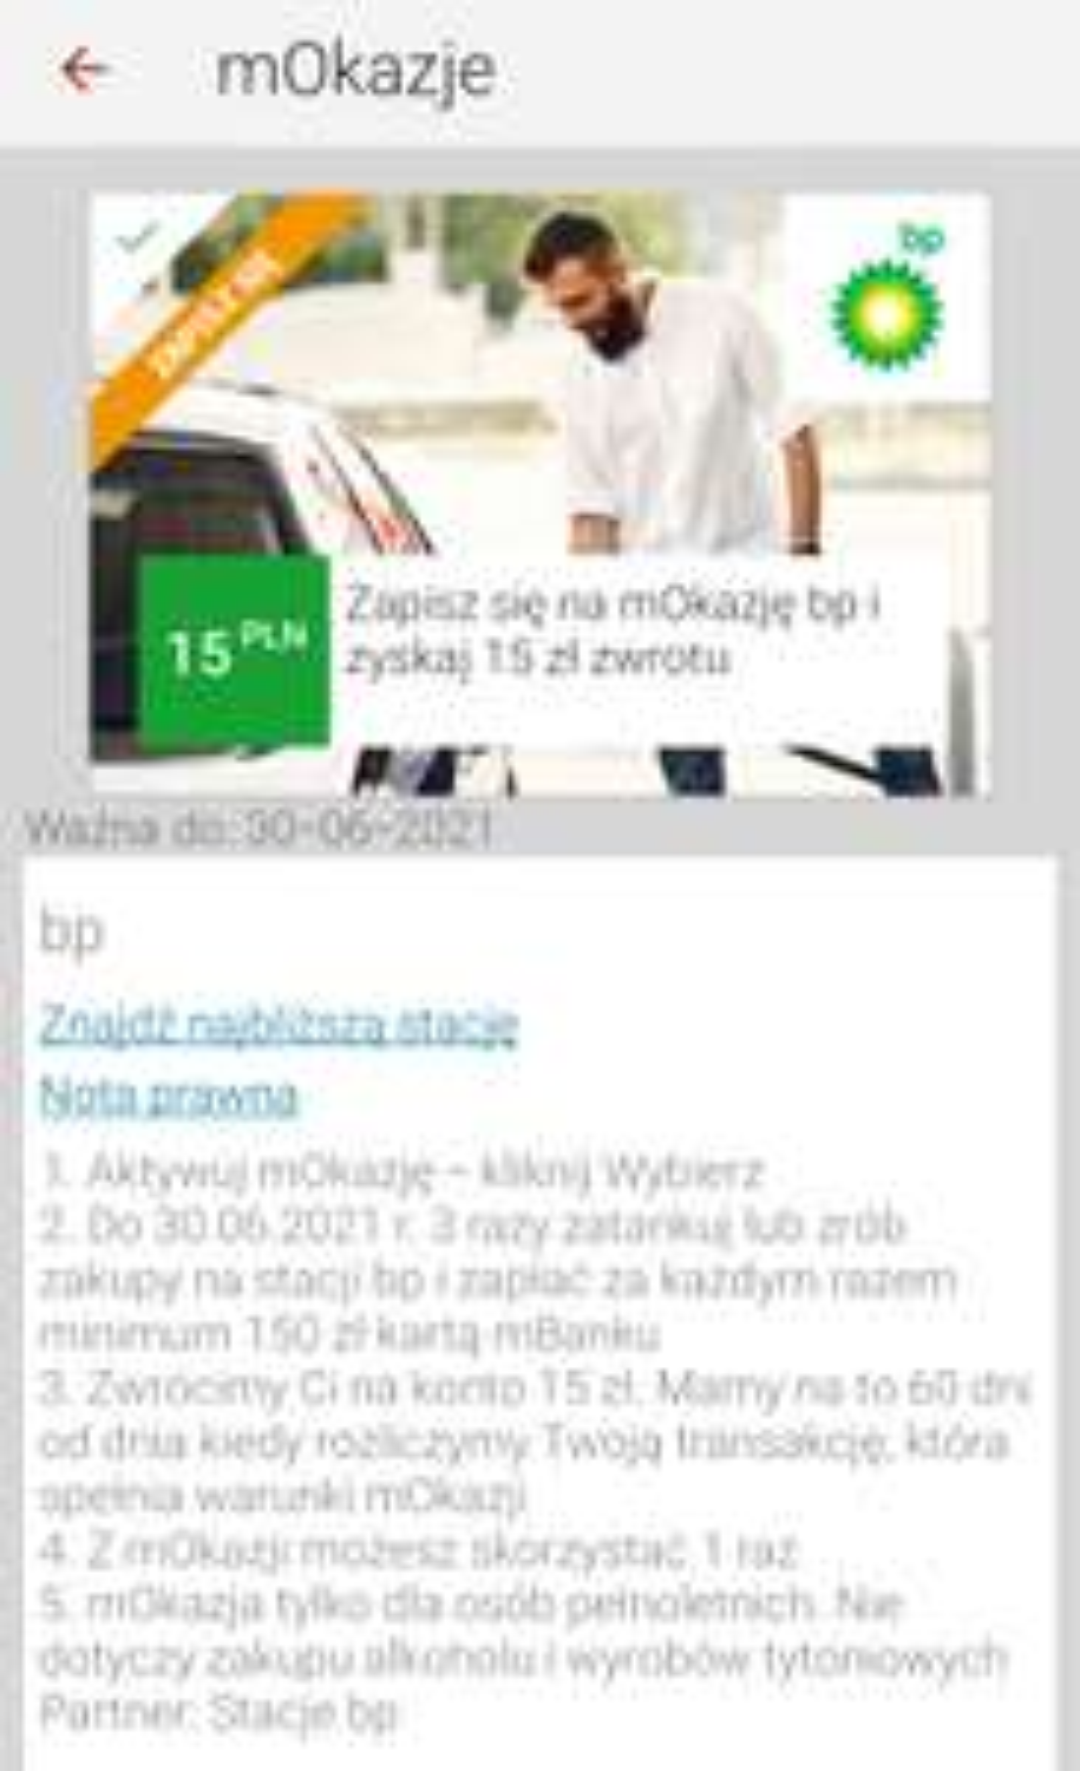 MBank nowa mOkazja paliw BP zwrot 15zl mwz 450